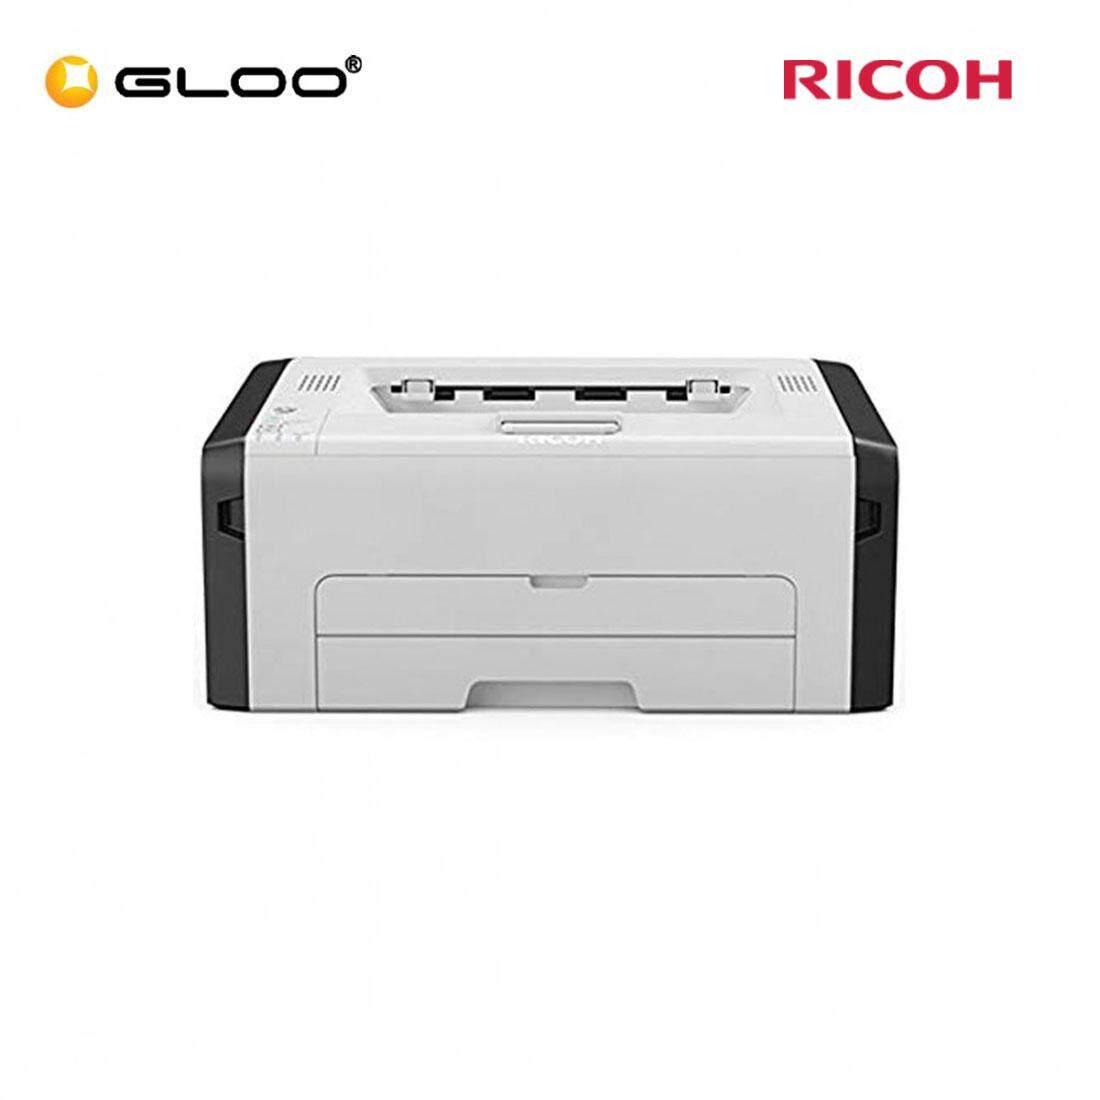 Ricoh SP 220NW B&W Laser Printer